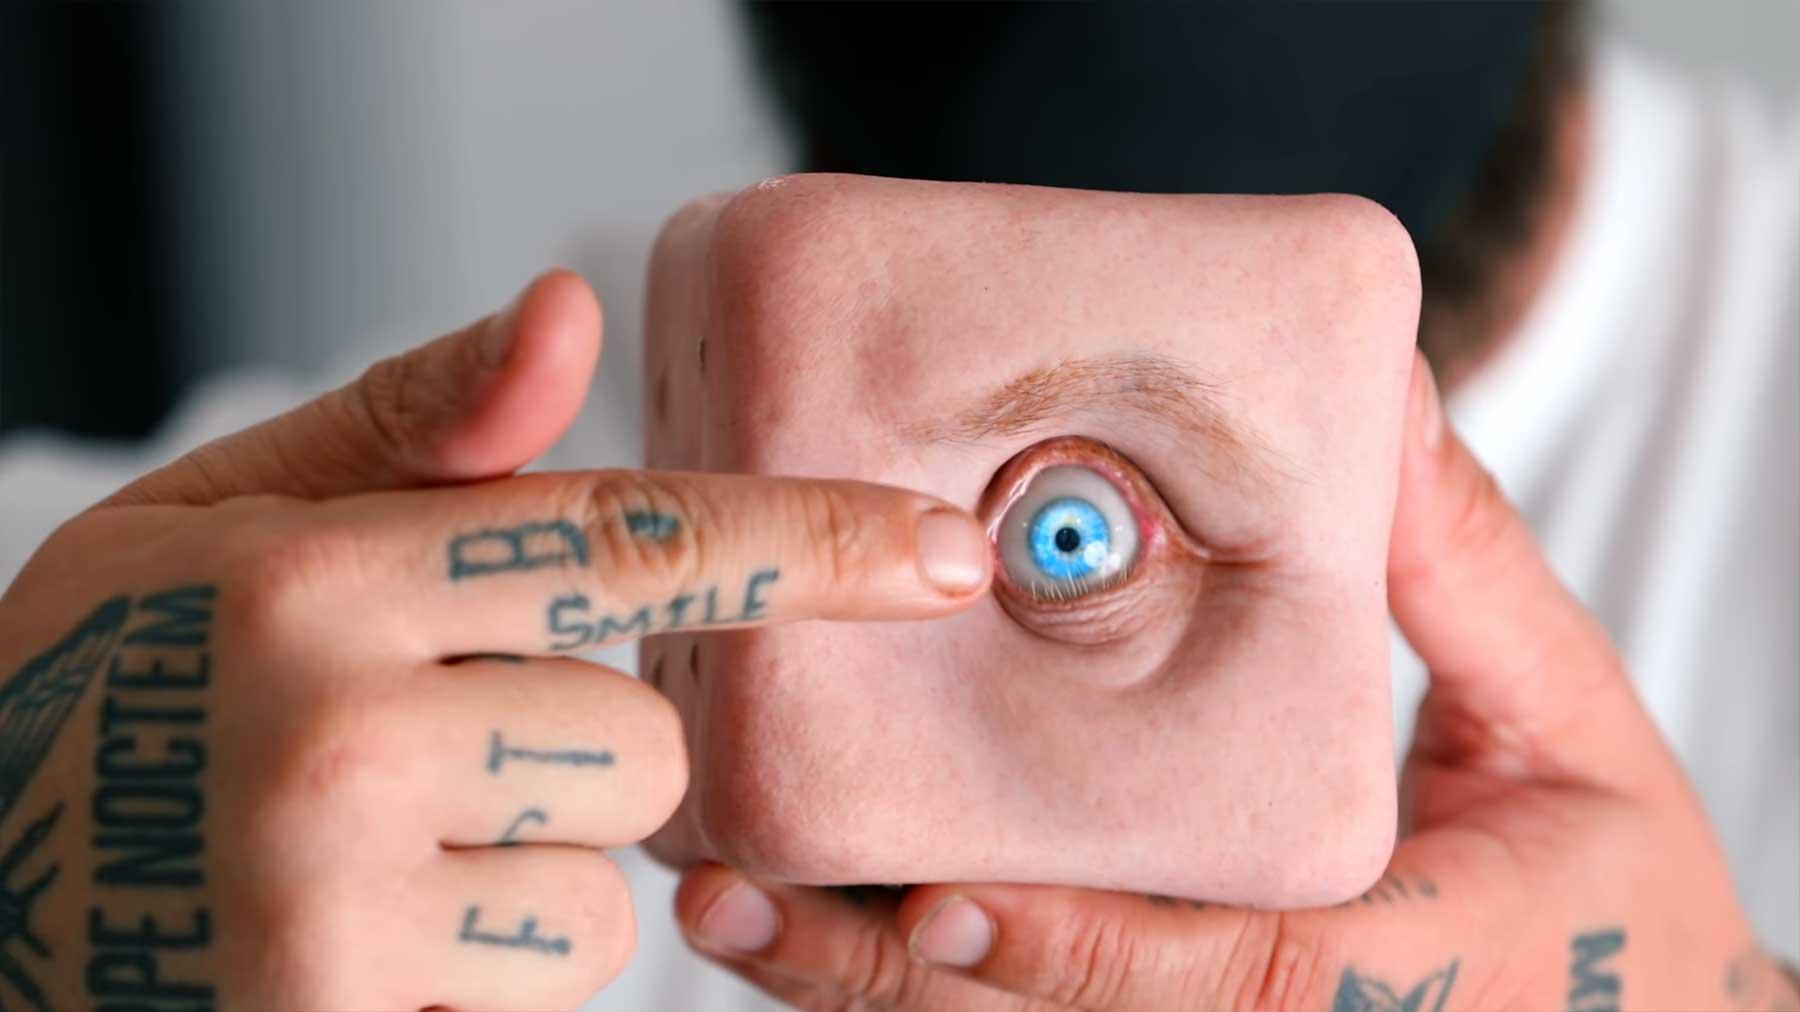 Creepy Roboter-Fleisch-Auge